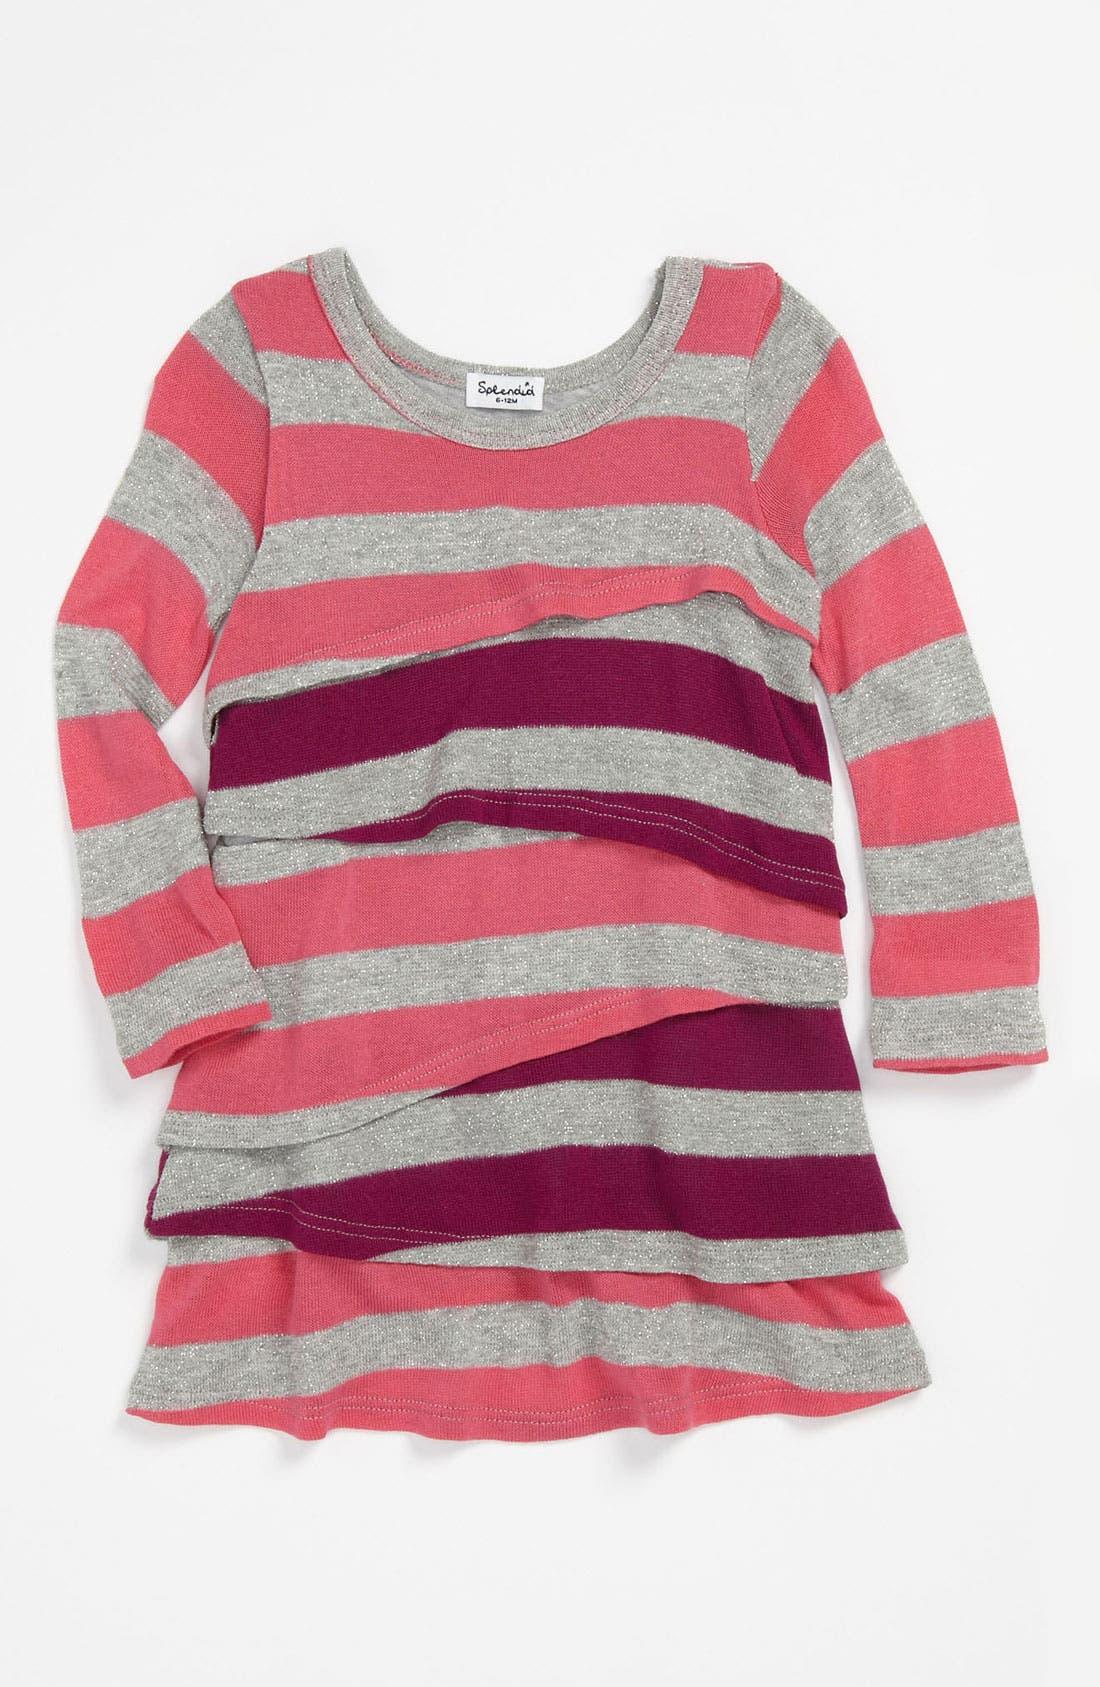 Alternate Image 1 Selected - Splendid 'Platinum' Stripe Dress (Infant)